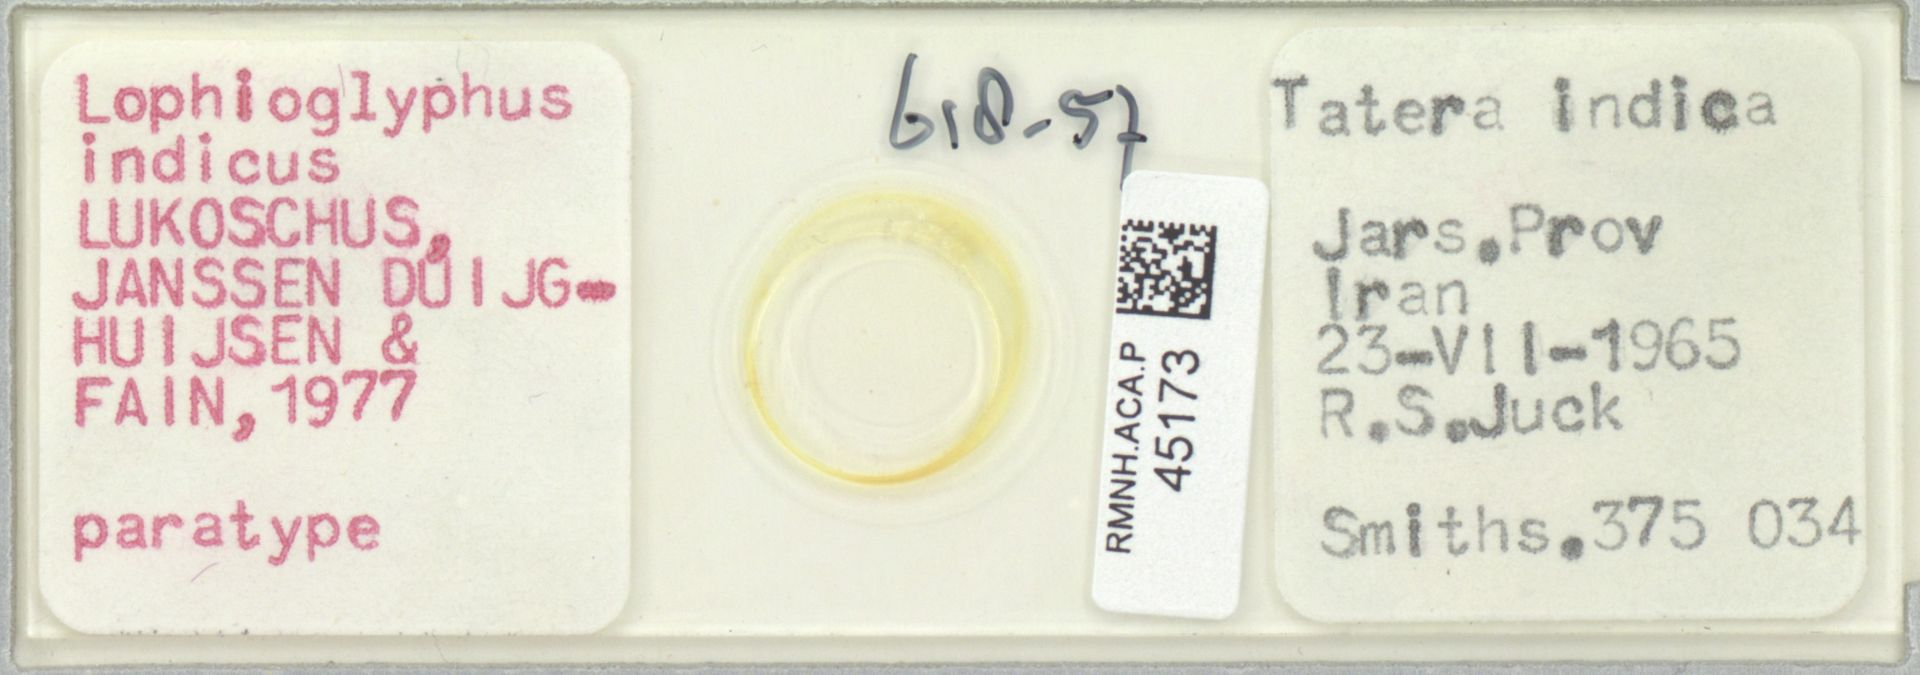 RMNH.ACA.P.45173 | Lophioglyphus indicus Lukoschus, Janssen Duijghuijsen & Fain, 1977